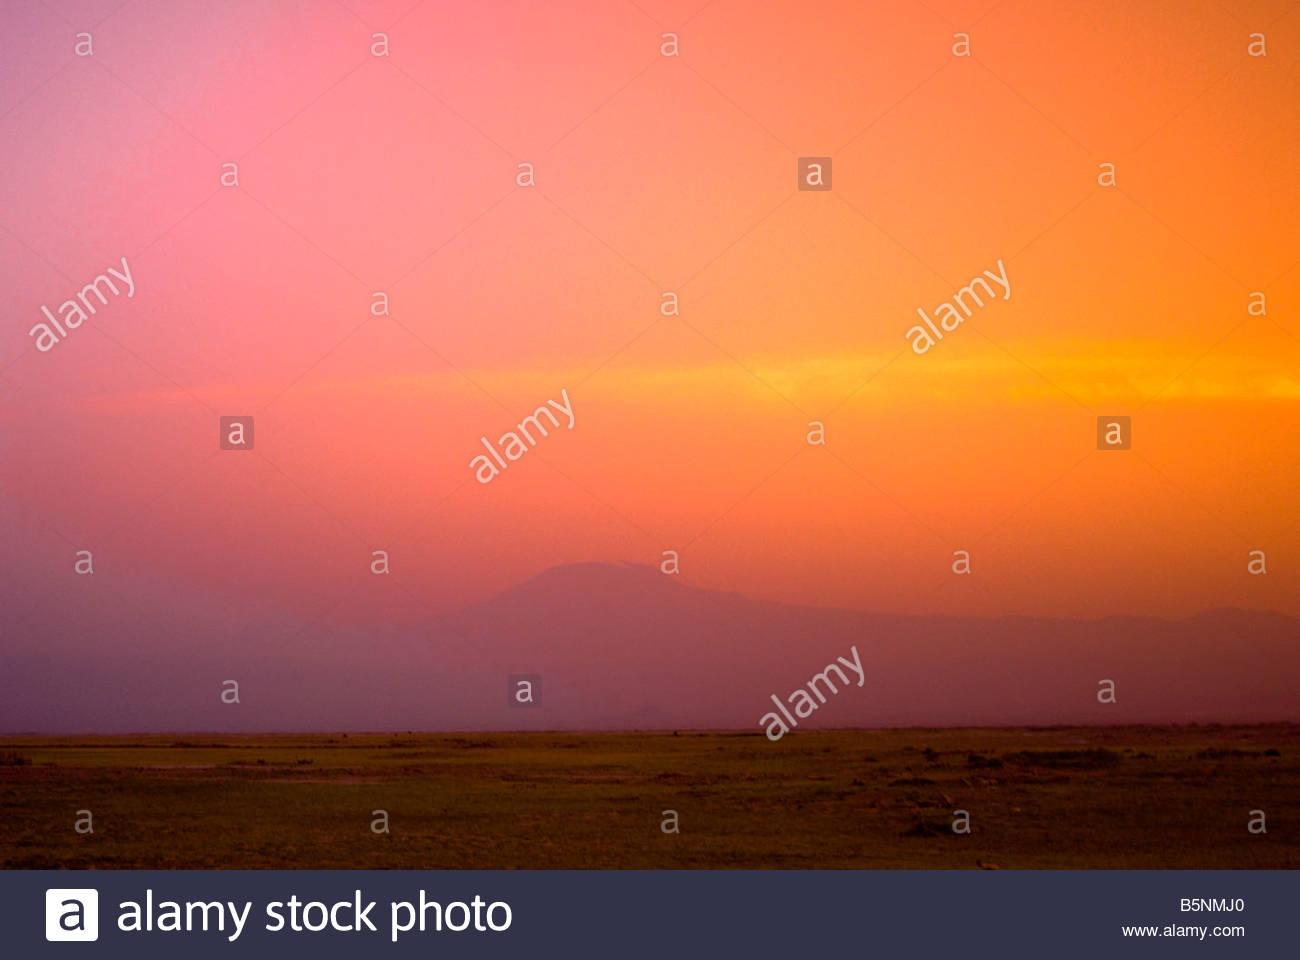 Mount Kilimanjaro at sunset seen from Amboseli National Park Kenya - Stock Image